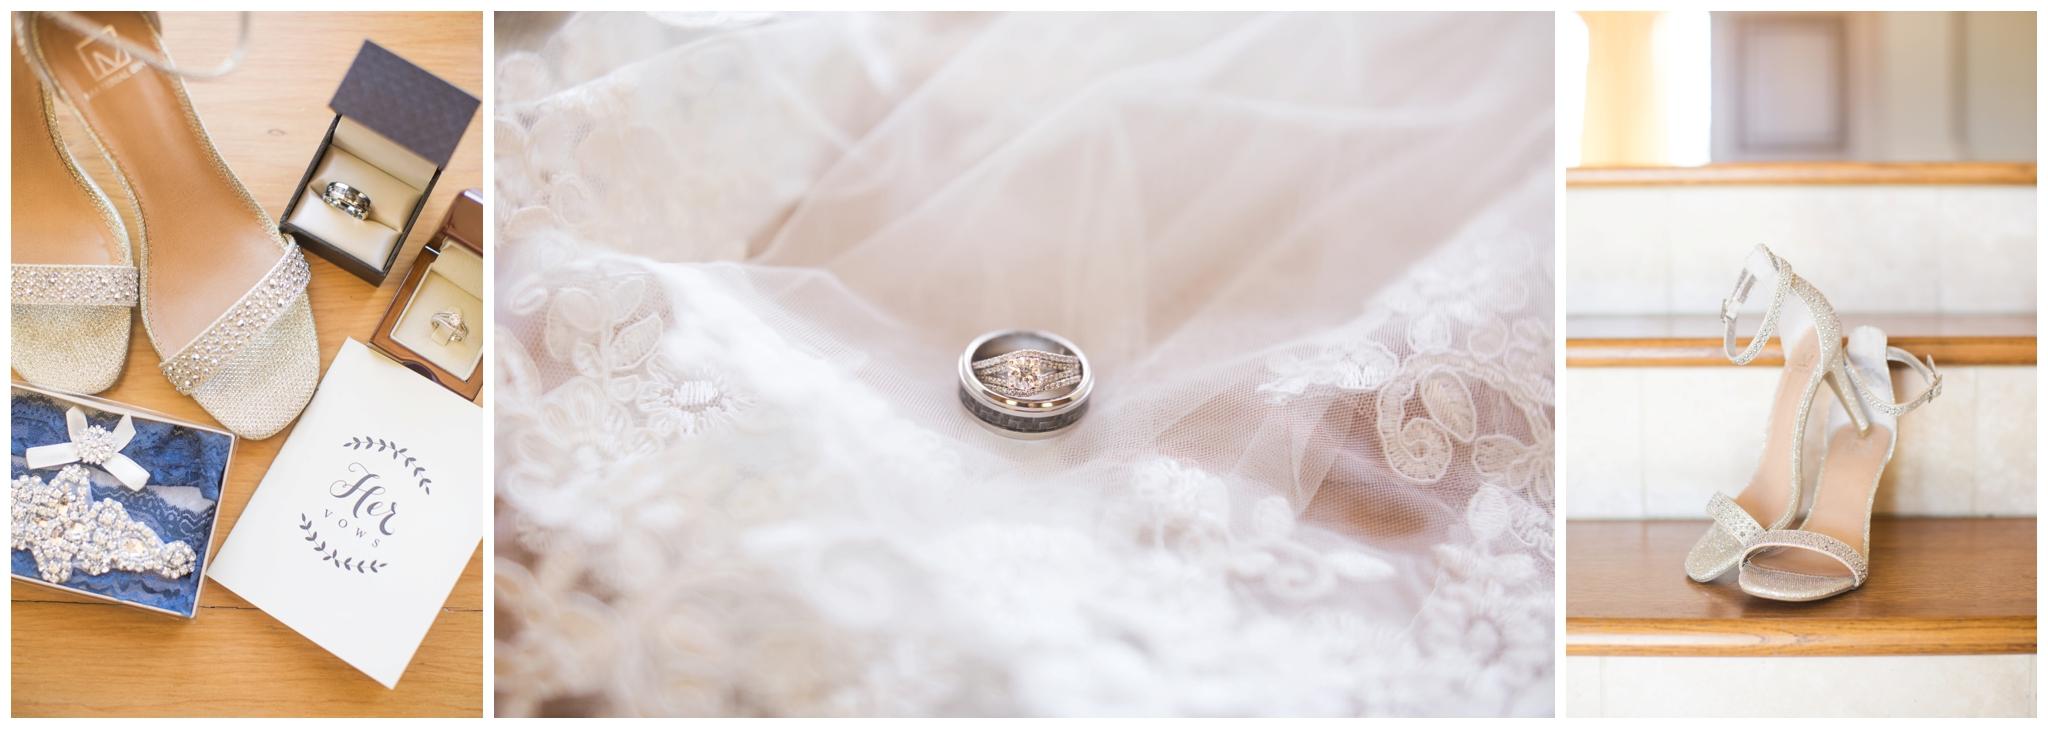 kassie_heath_cottonwood_wedding_blog_0001.jpg